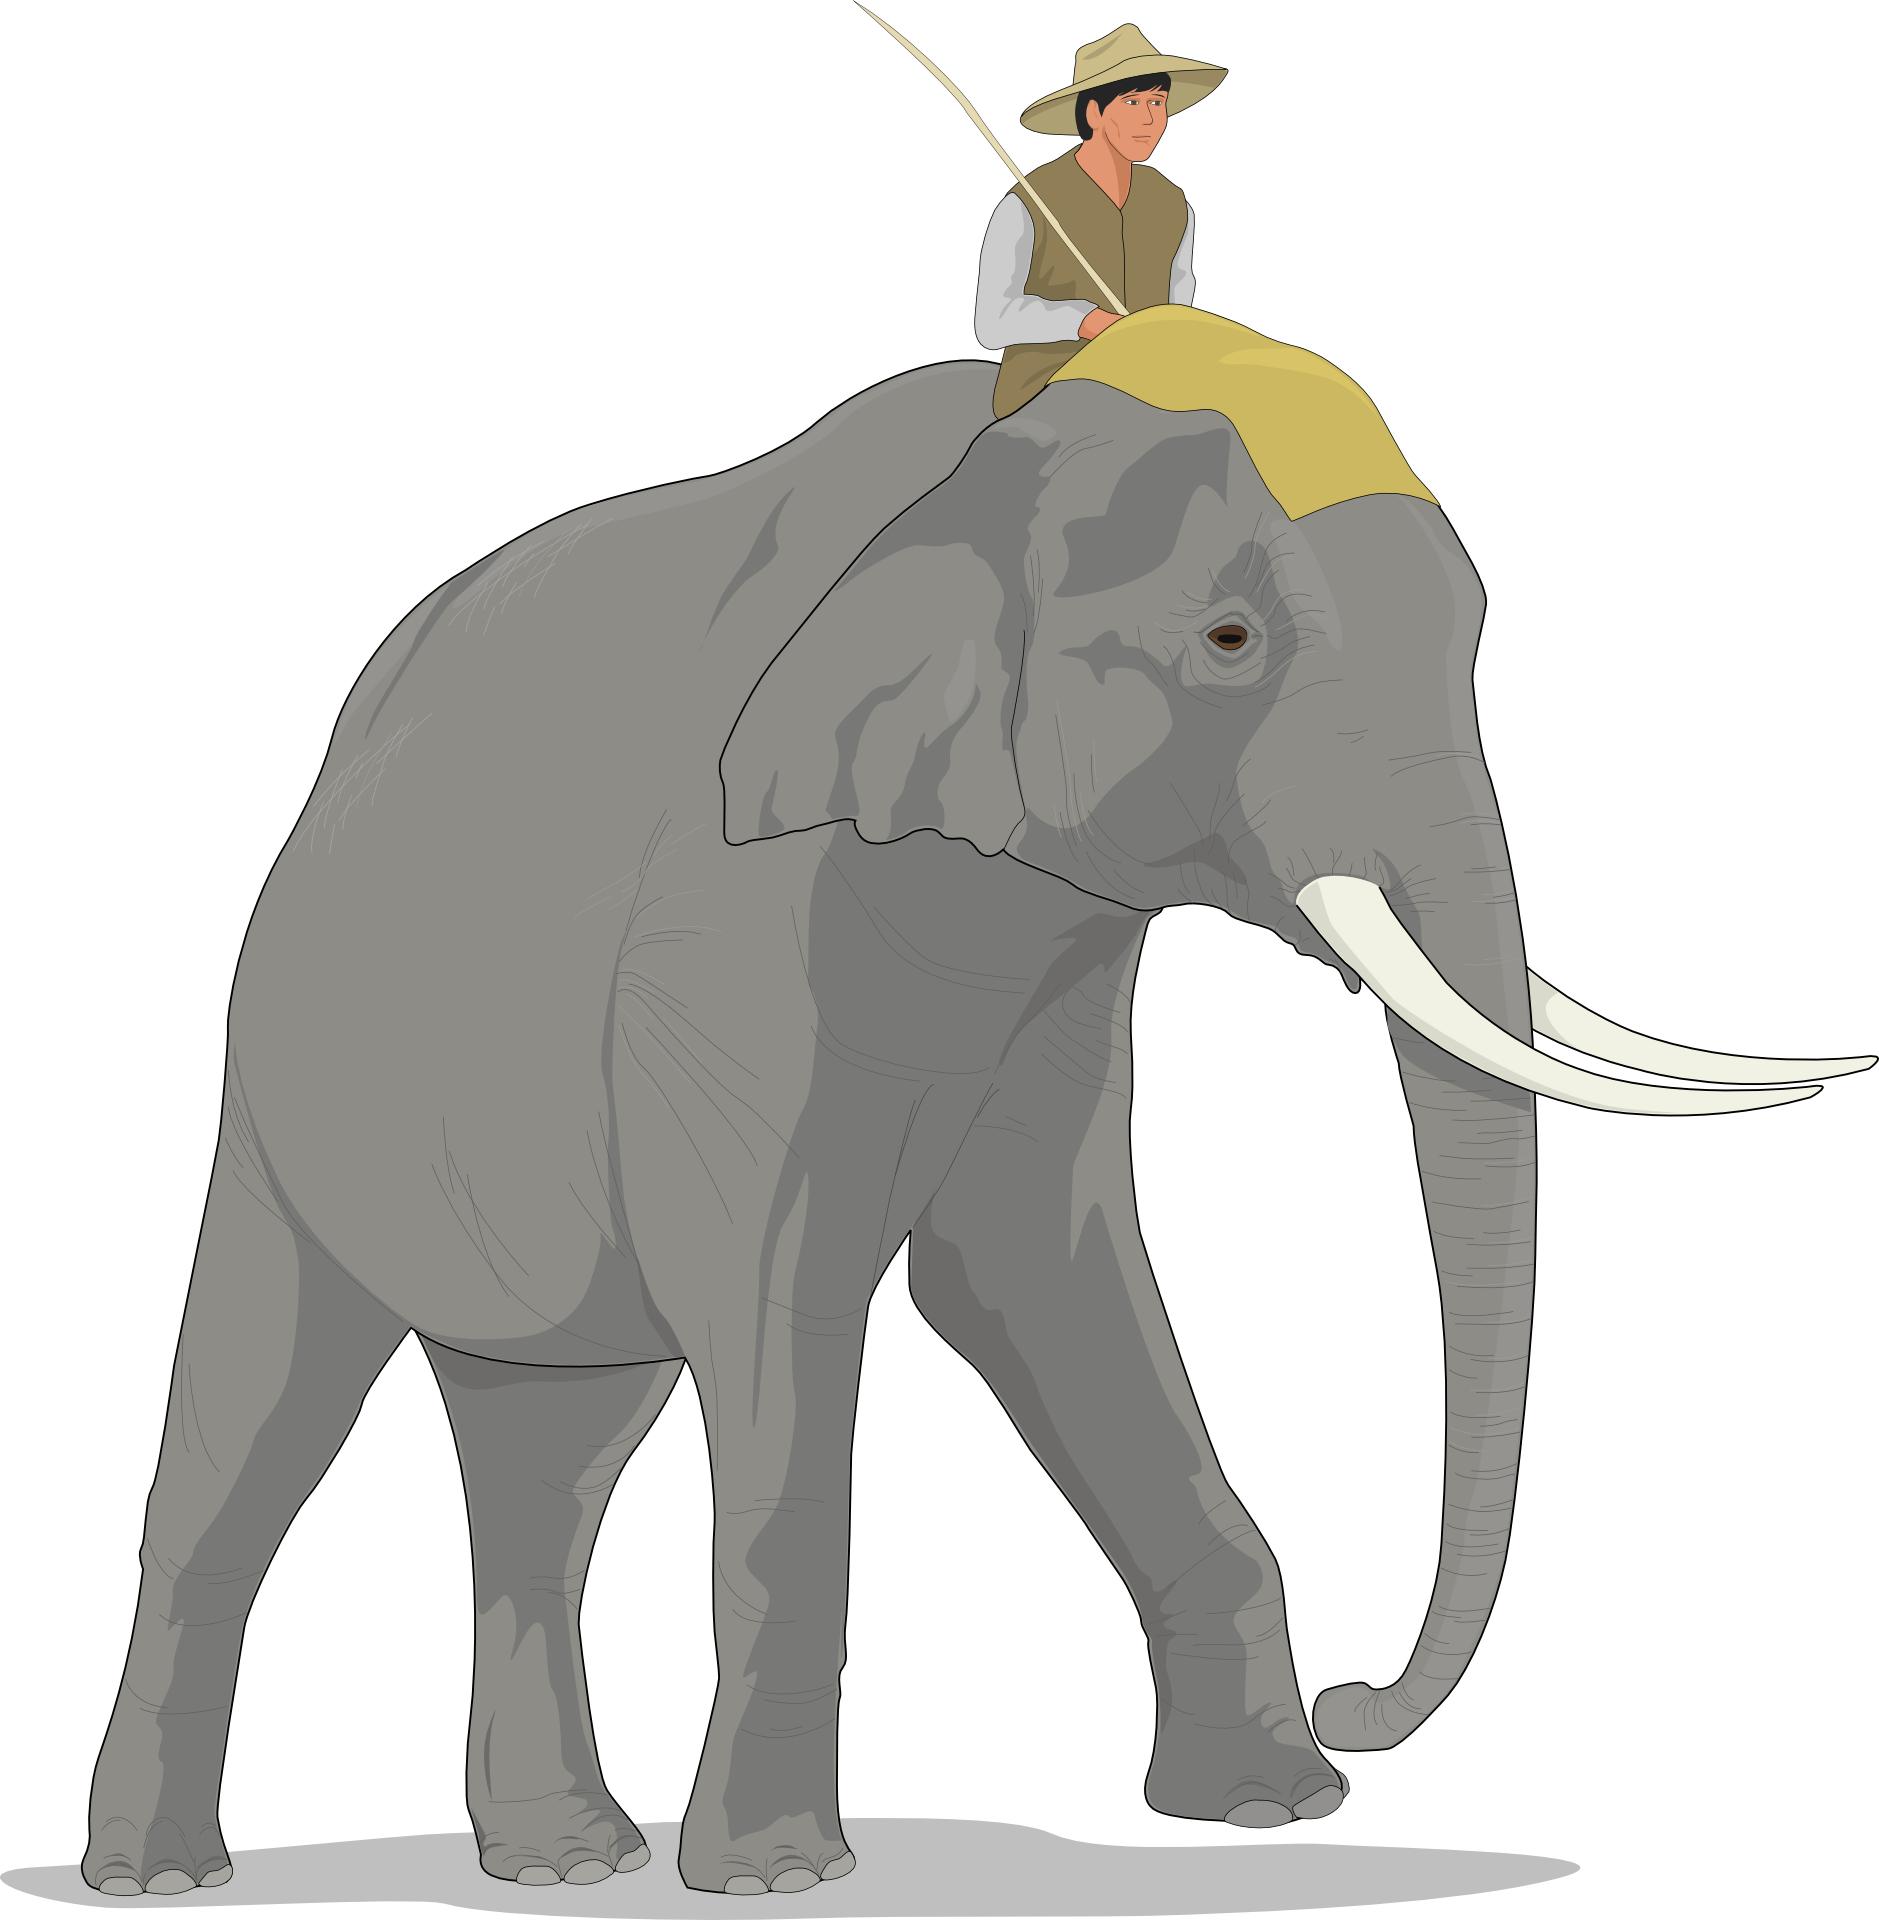 Brown elephant vector, rider